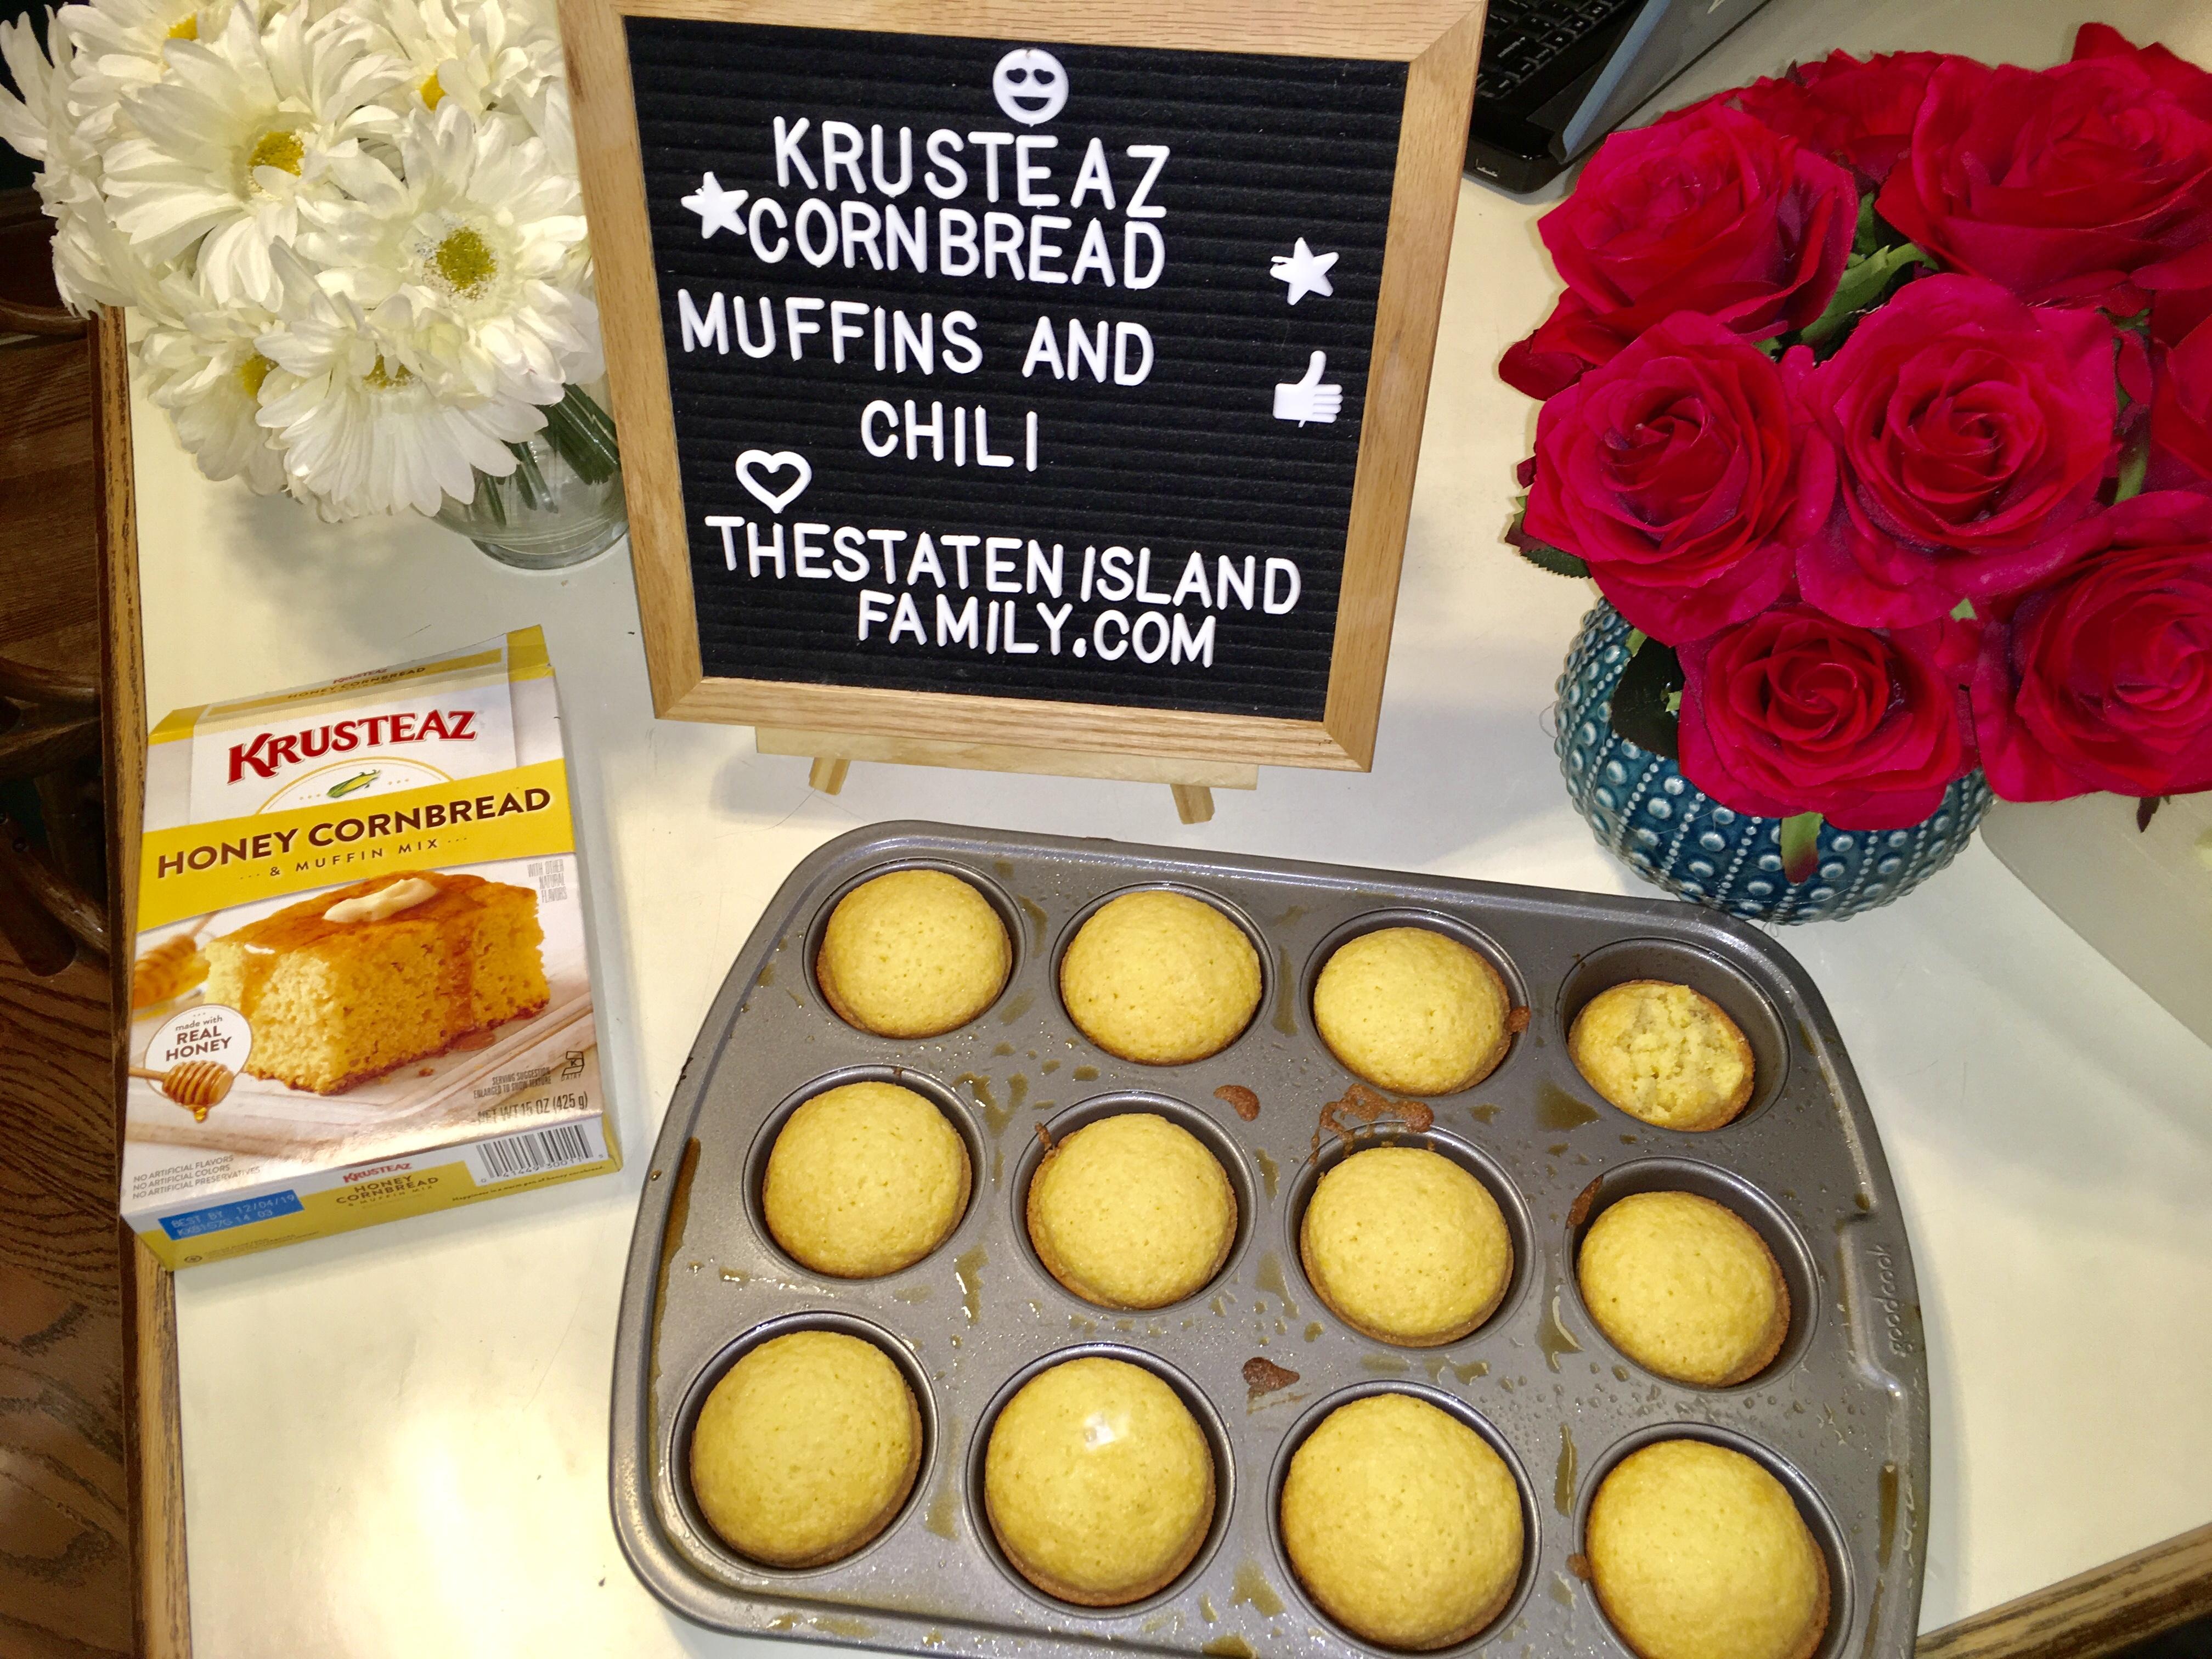 Game Day Vegetarian Chili and Krusteaz Cornbread Muffin Recipe